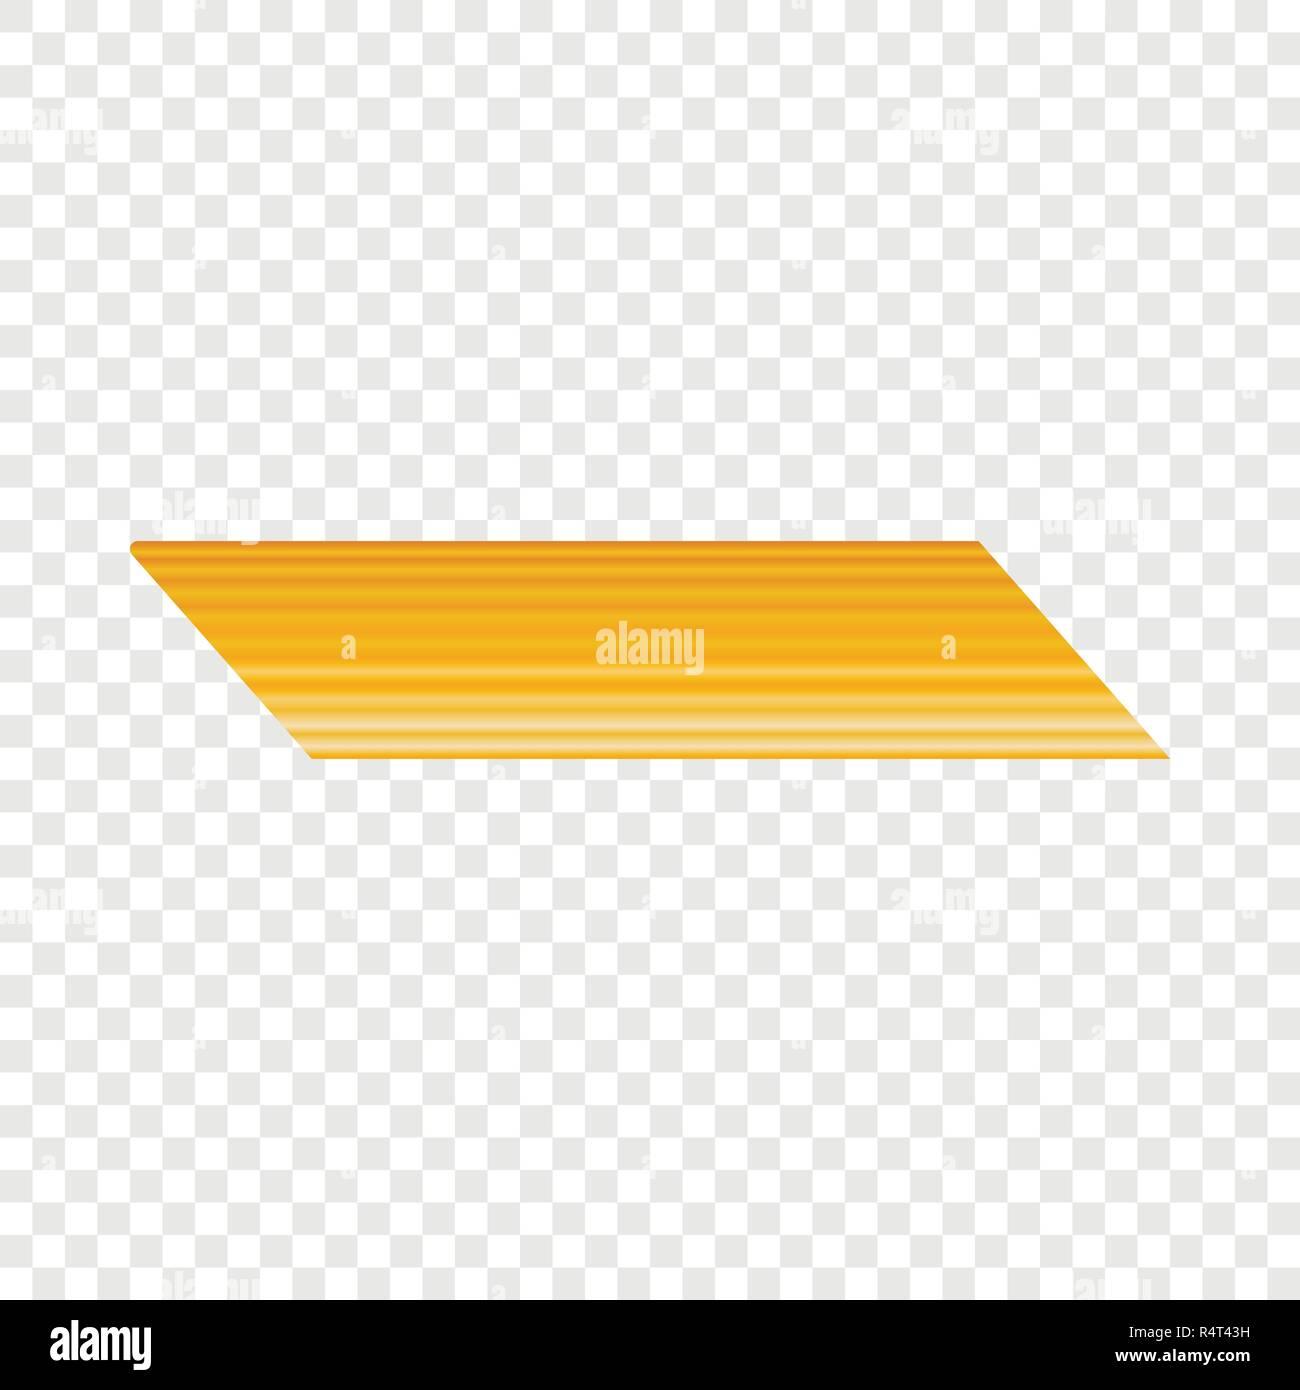 Penne rigate pasta icon. Realistic illustration of penne rigate pasta vector icon for on transparent background Stock Vector